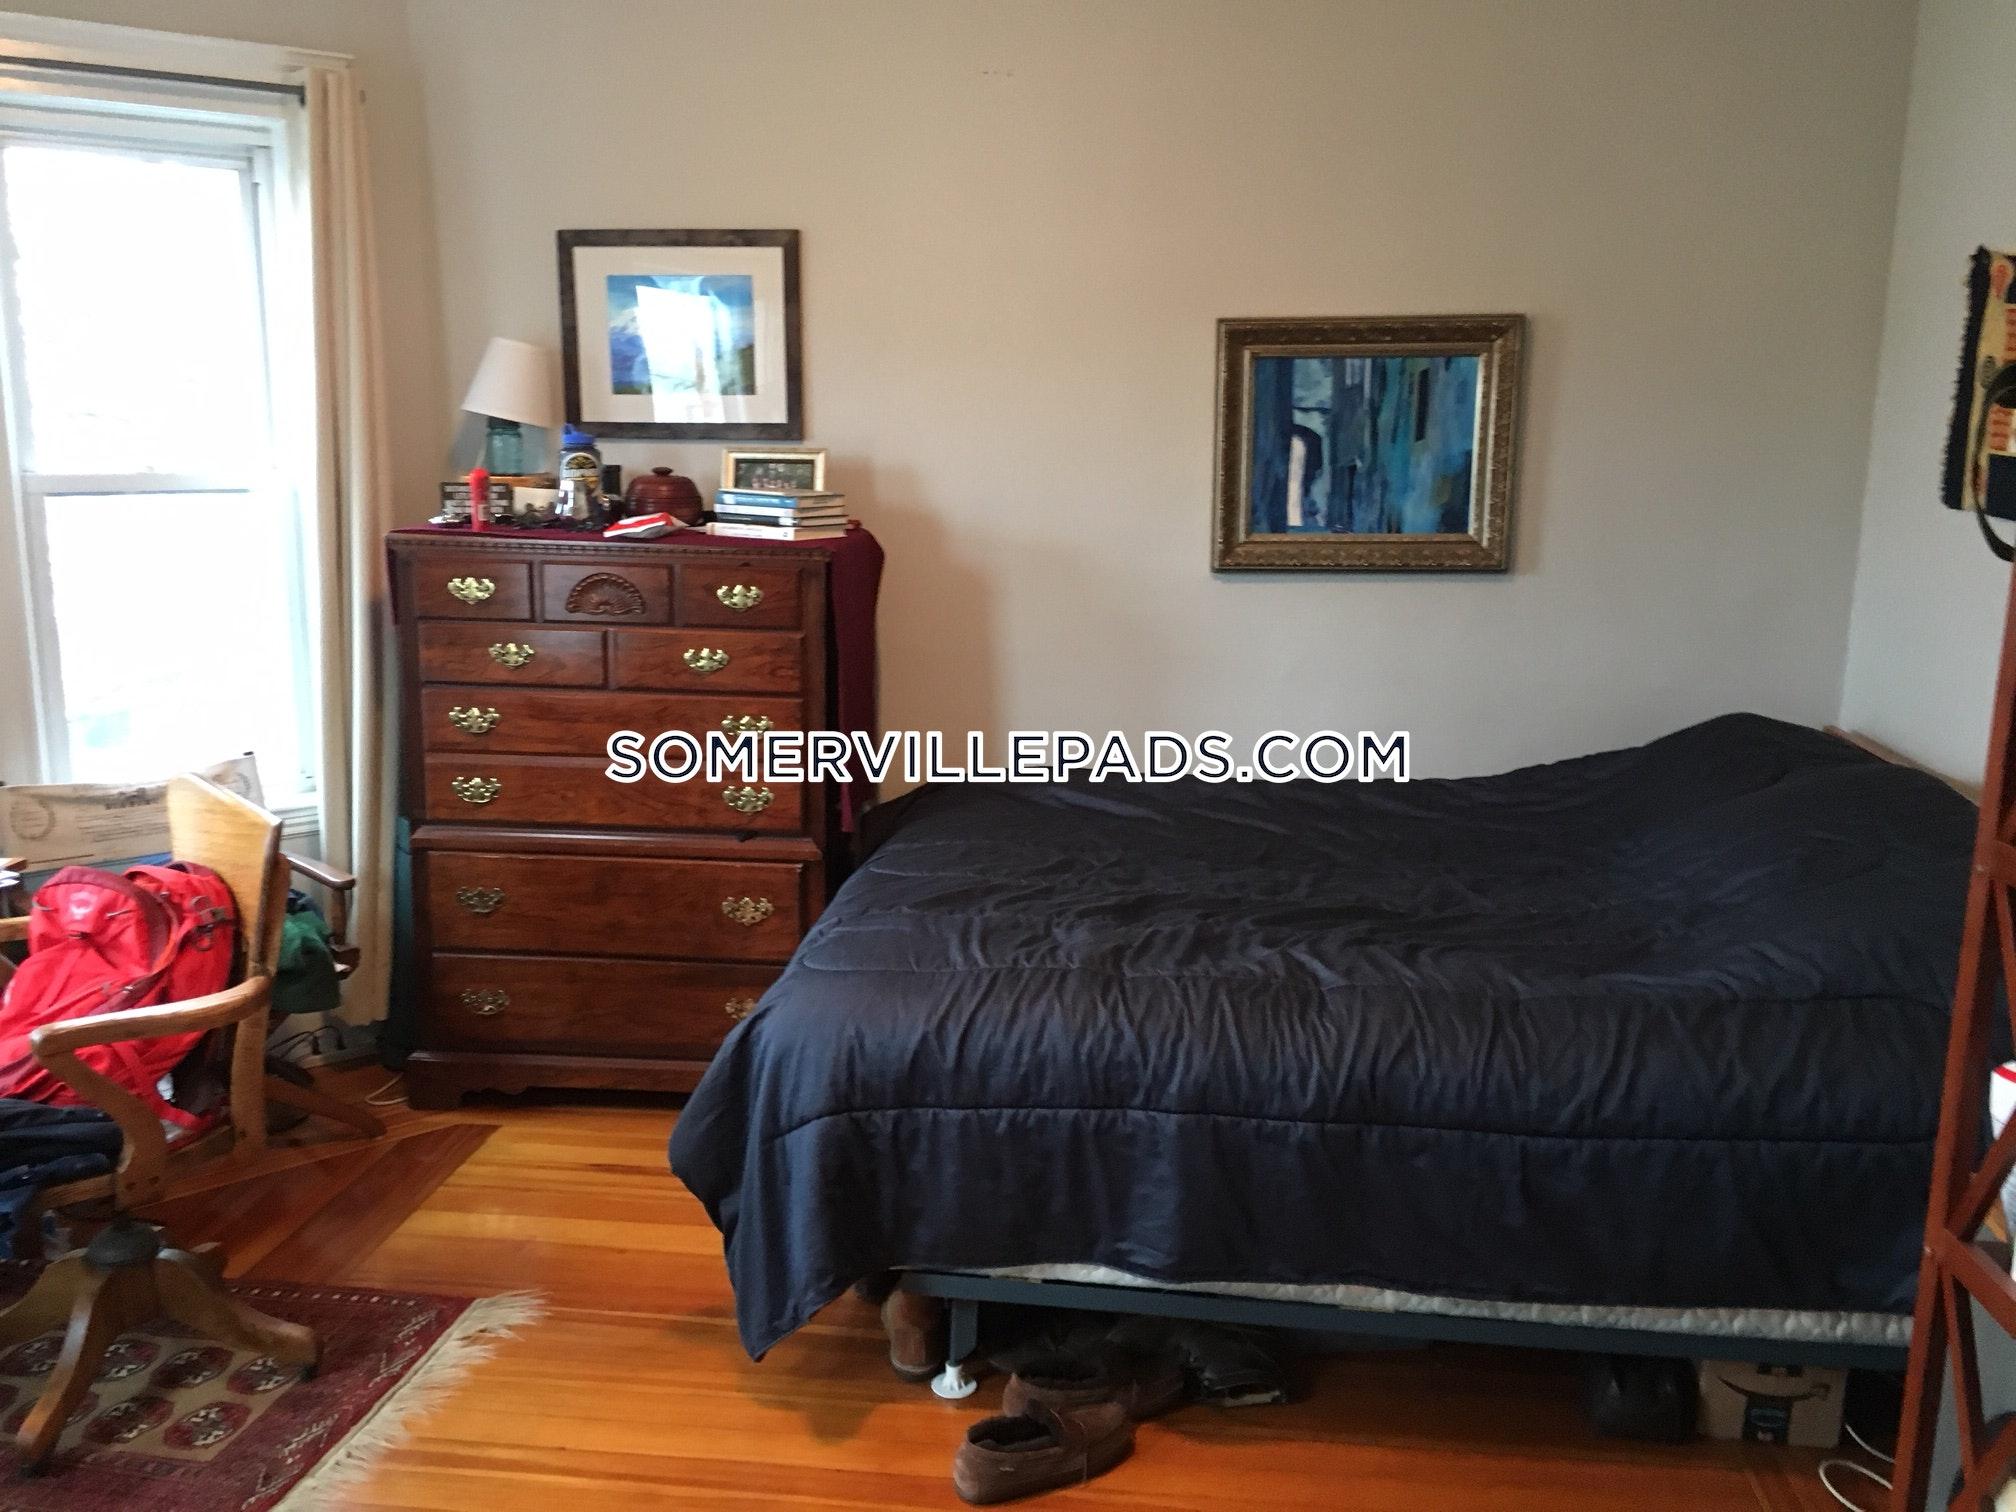 3-beds-1-bath-somerville-tufts-3250-445002